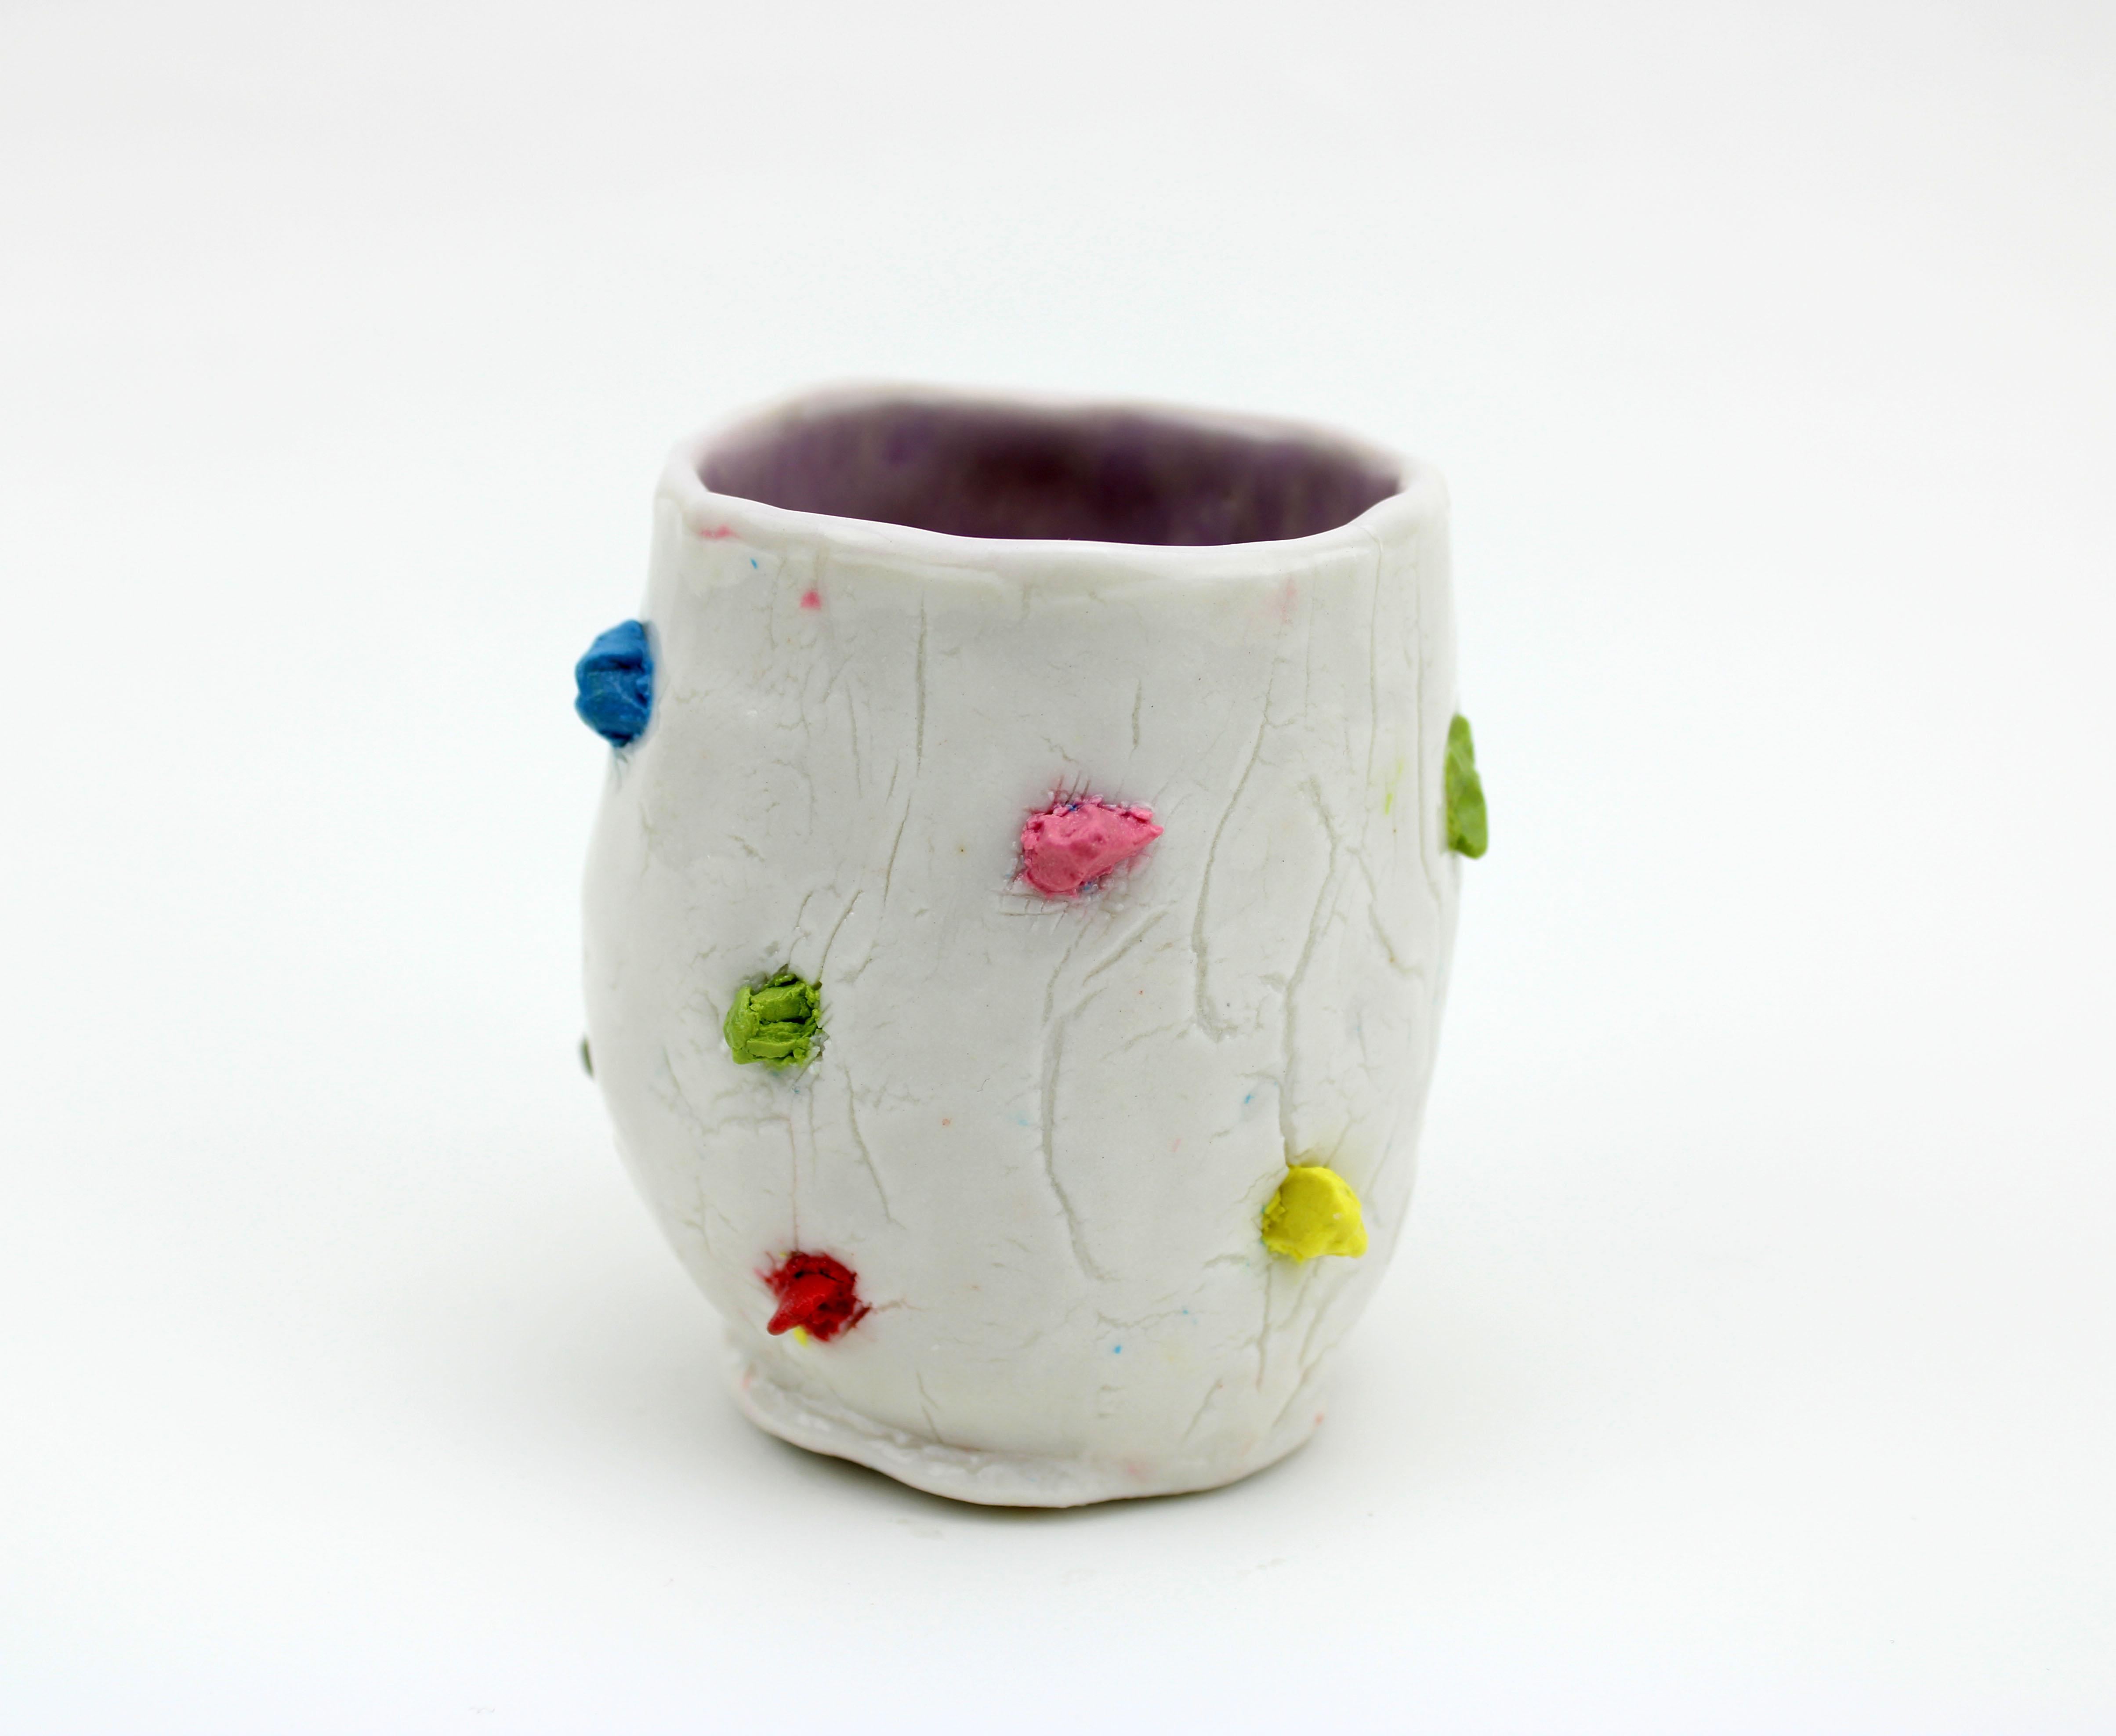 colored porcelain chunks image 4.jpg